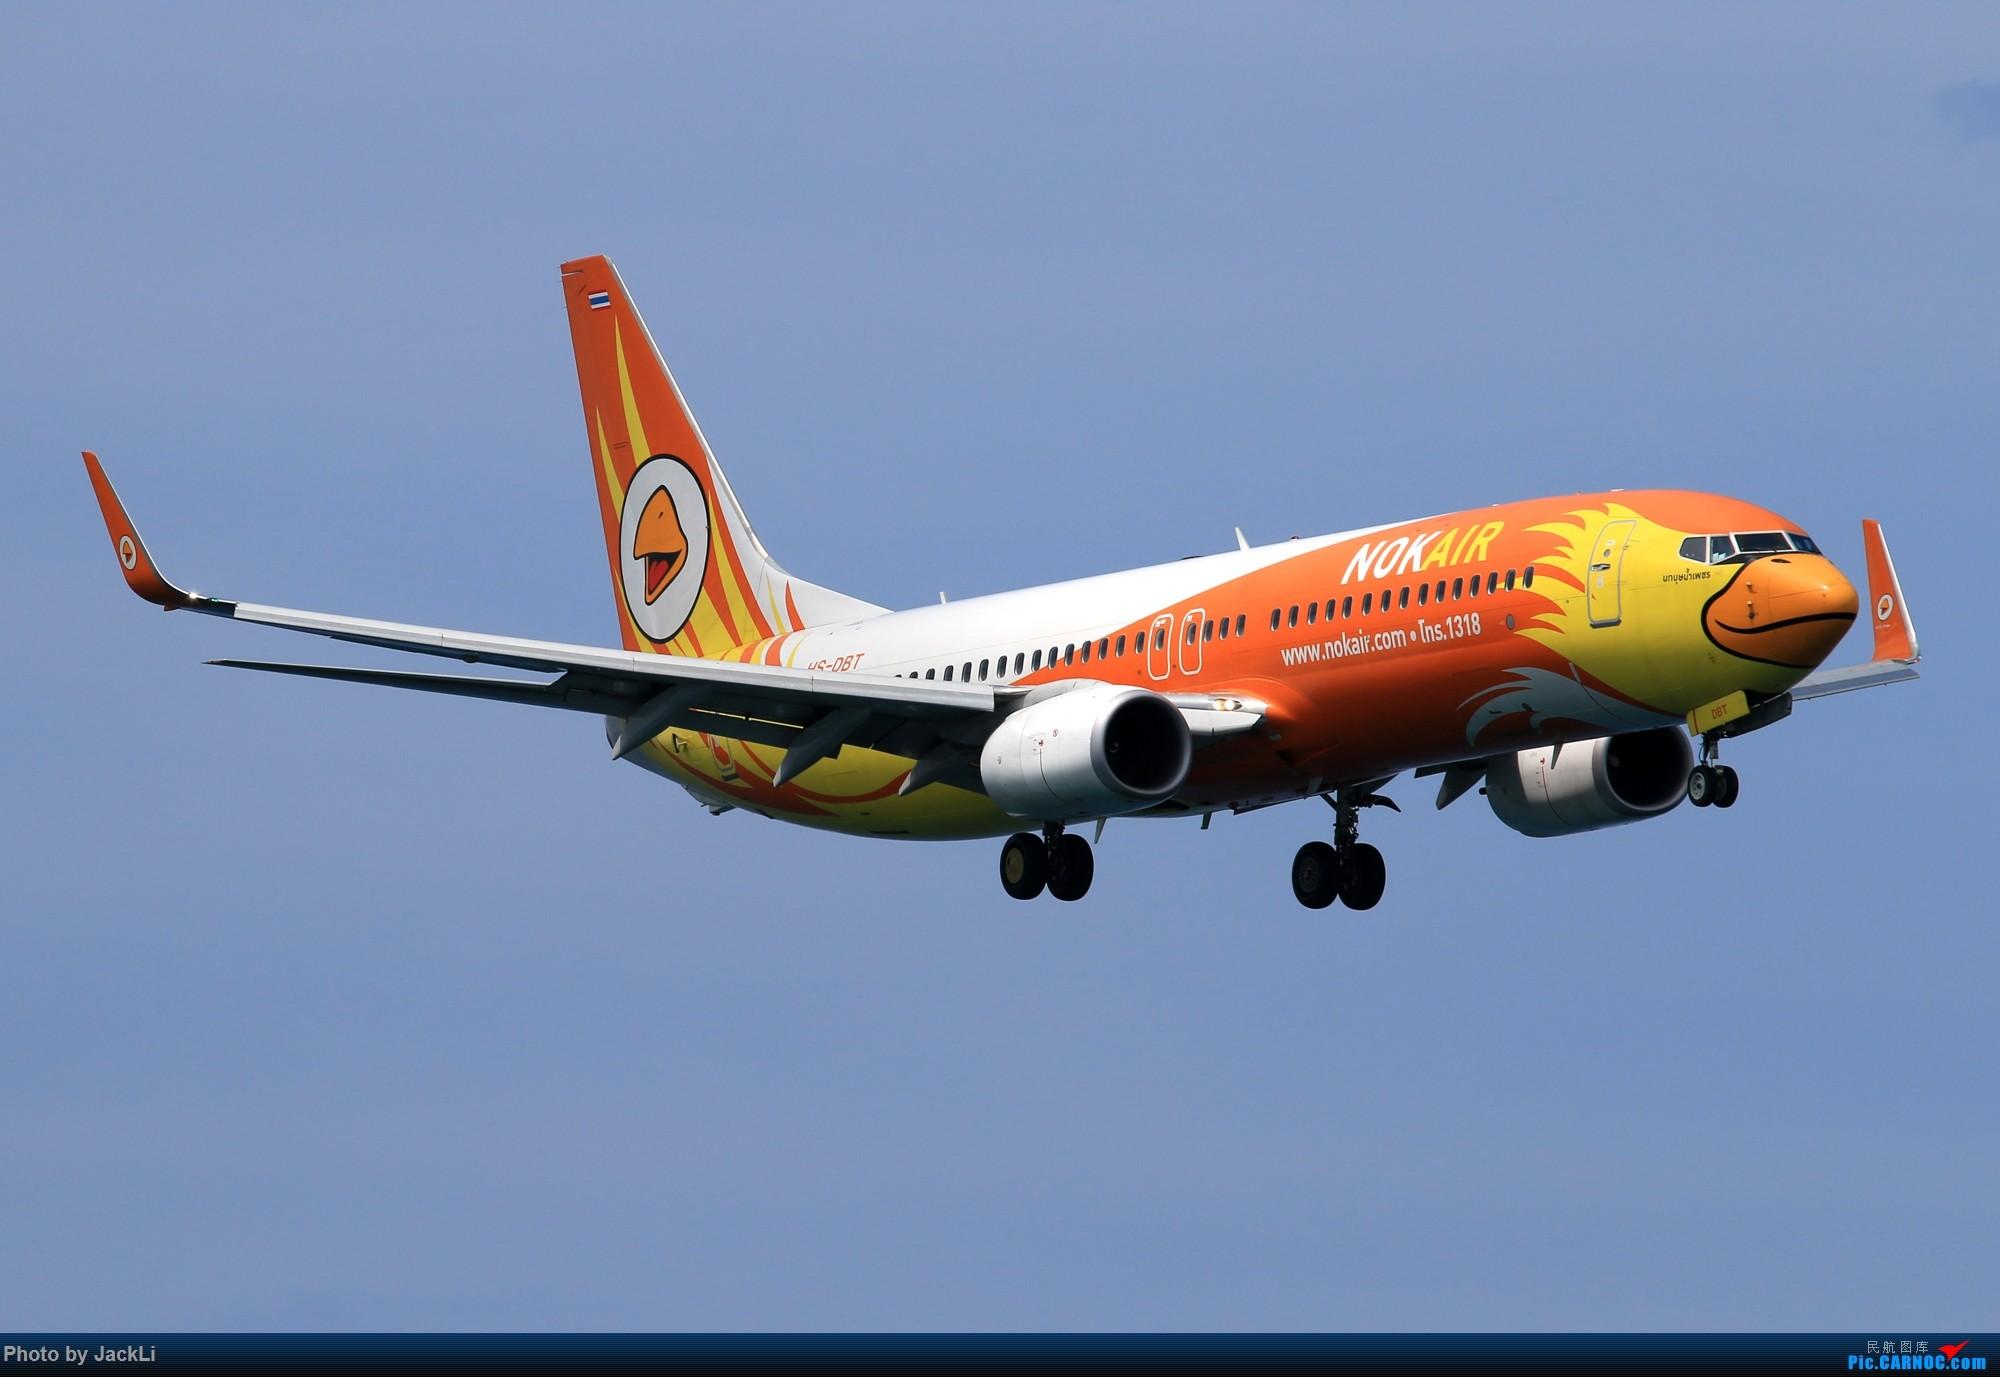 Re:[原创]【JackLi】亚洲圣马丁~普吉岛机场拍机 BOEING 737-800 HS-DBT 泰国普吉机场